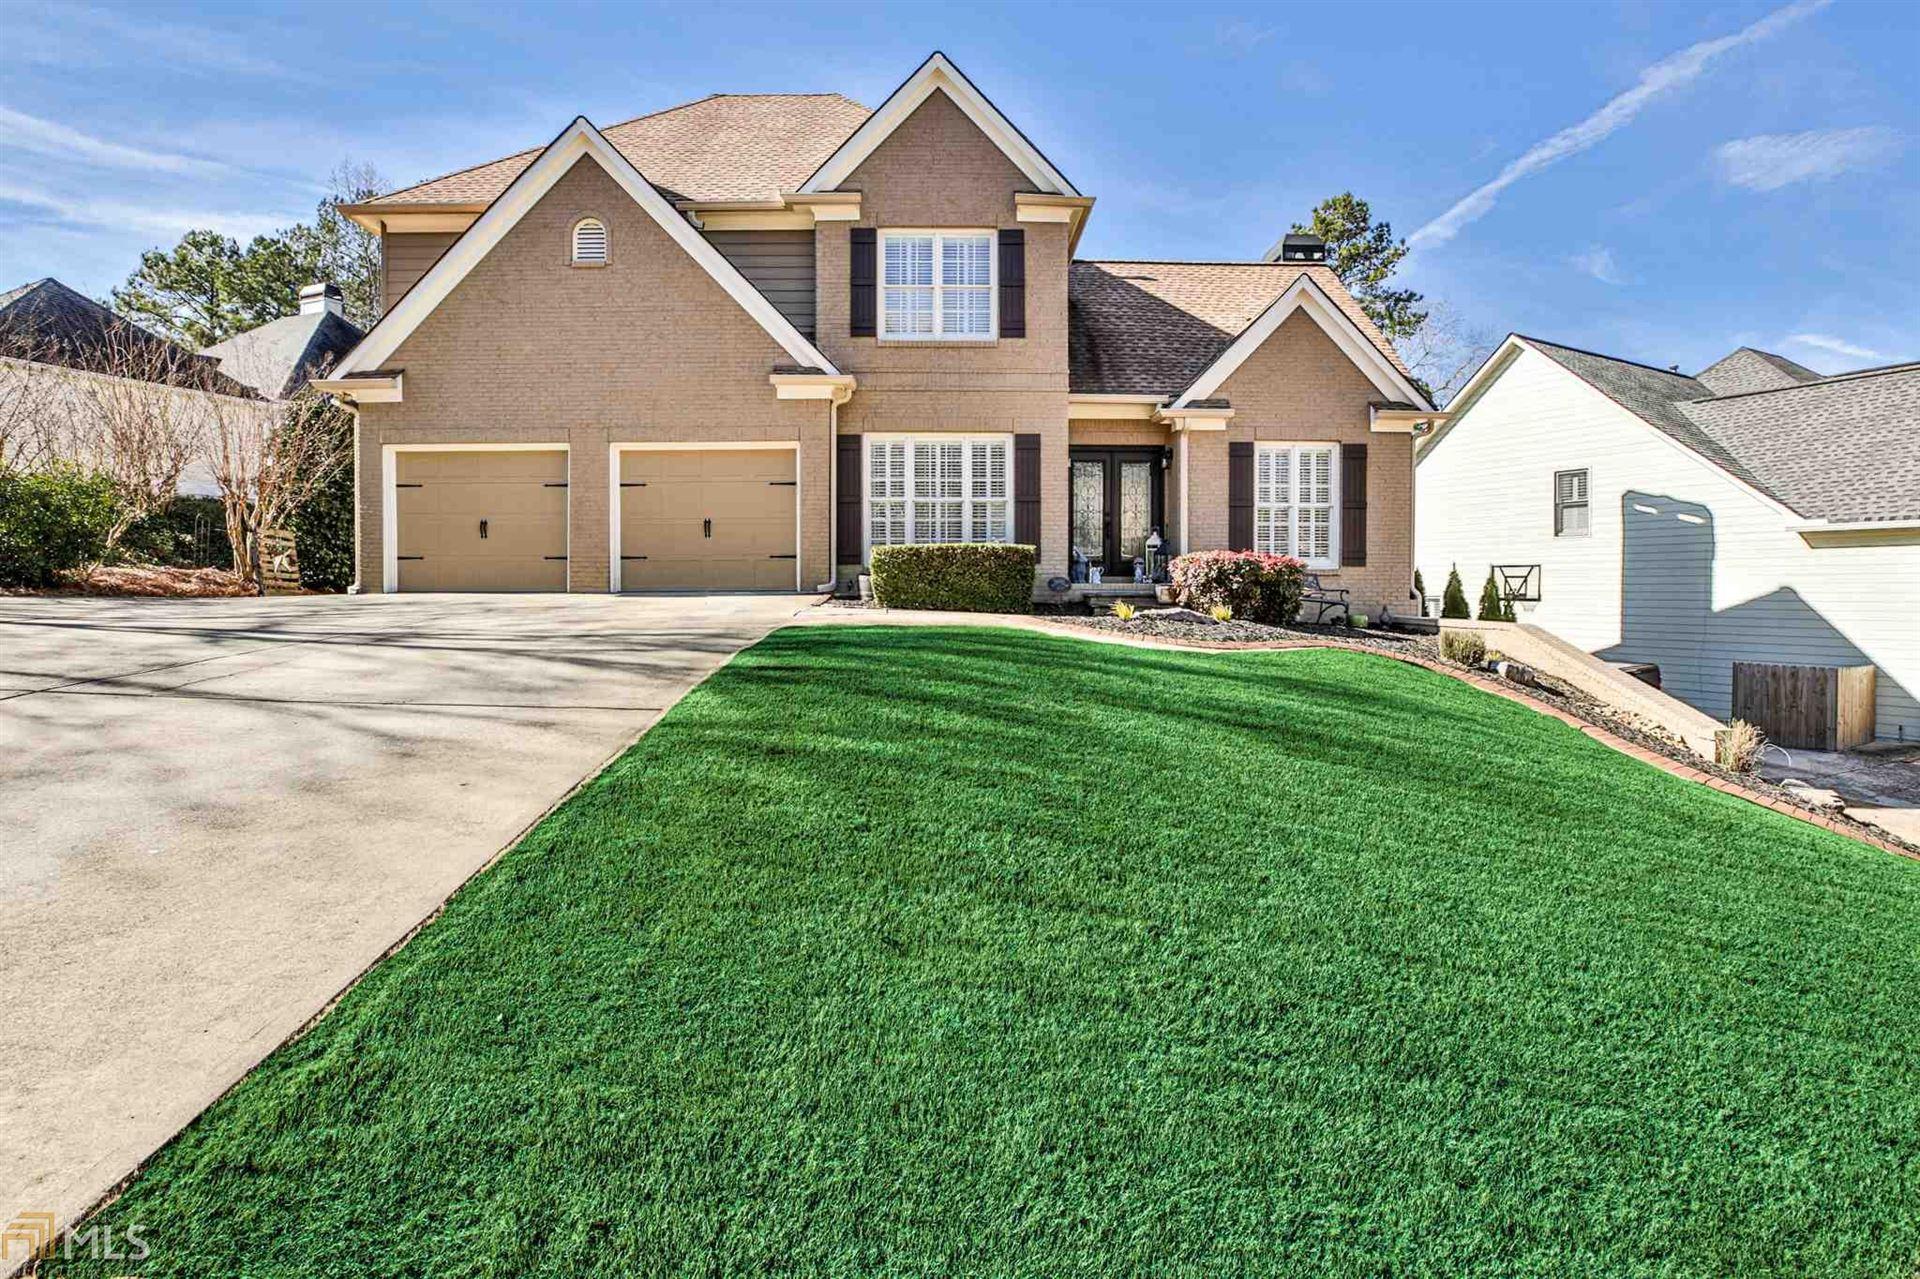 610 Redwood Ln, Canton, GA 30114 - MLS#: 8910807